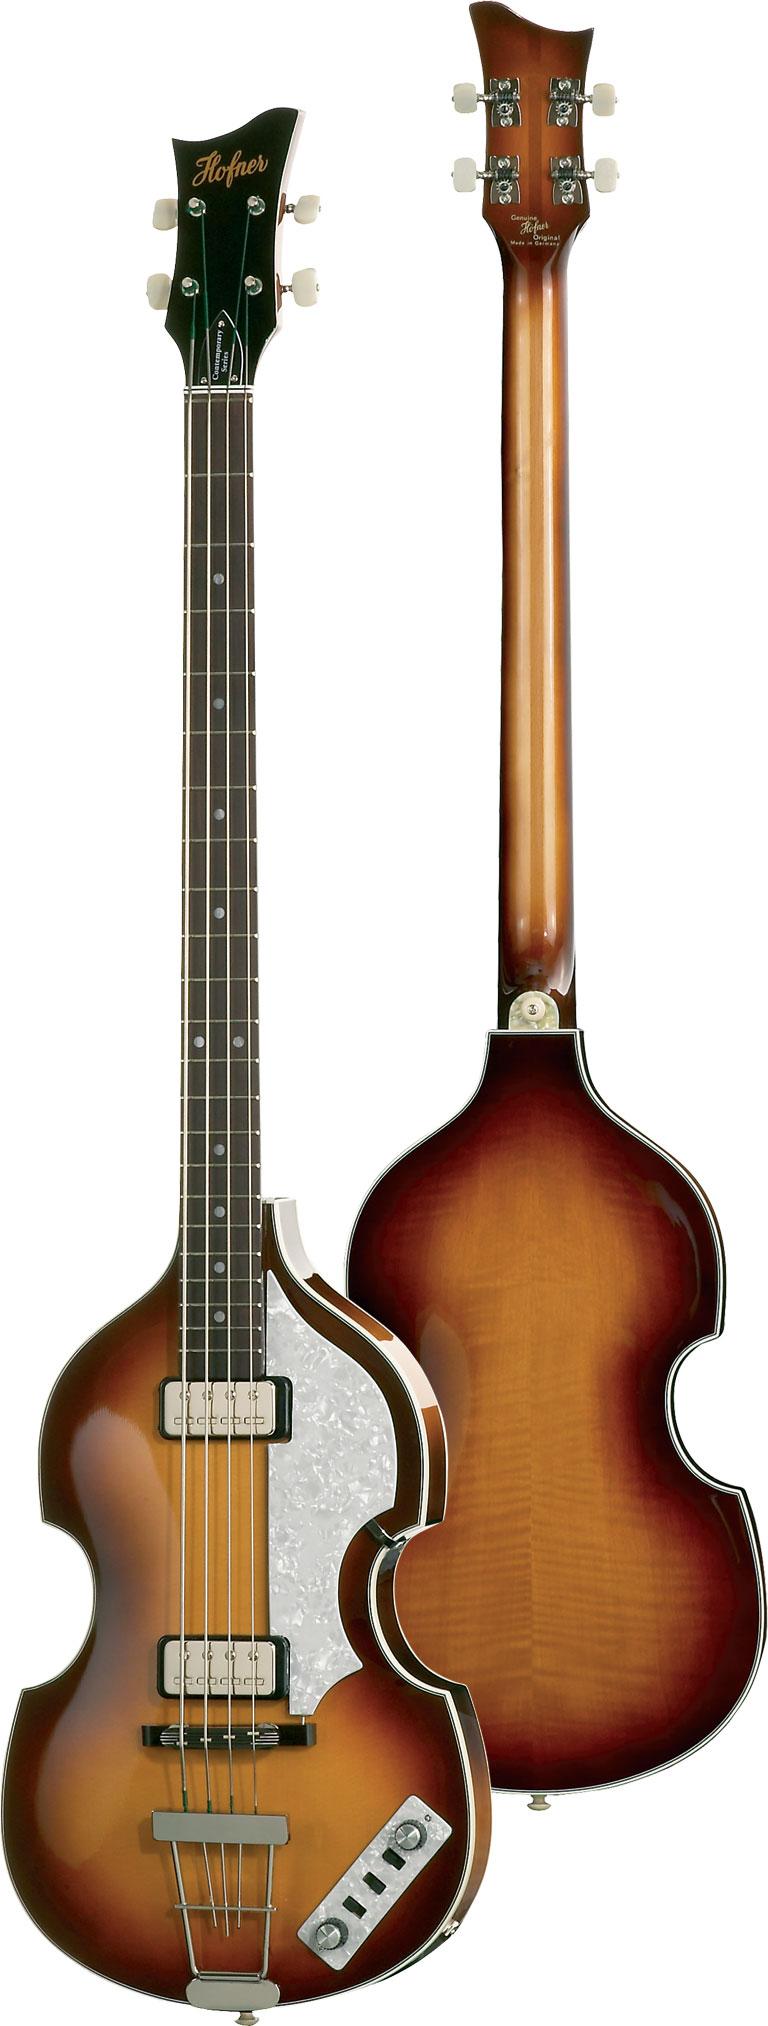 Hofner HCT Violin Bass Sunburst Lefthanded